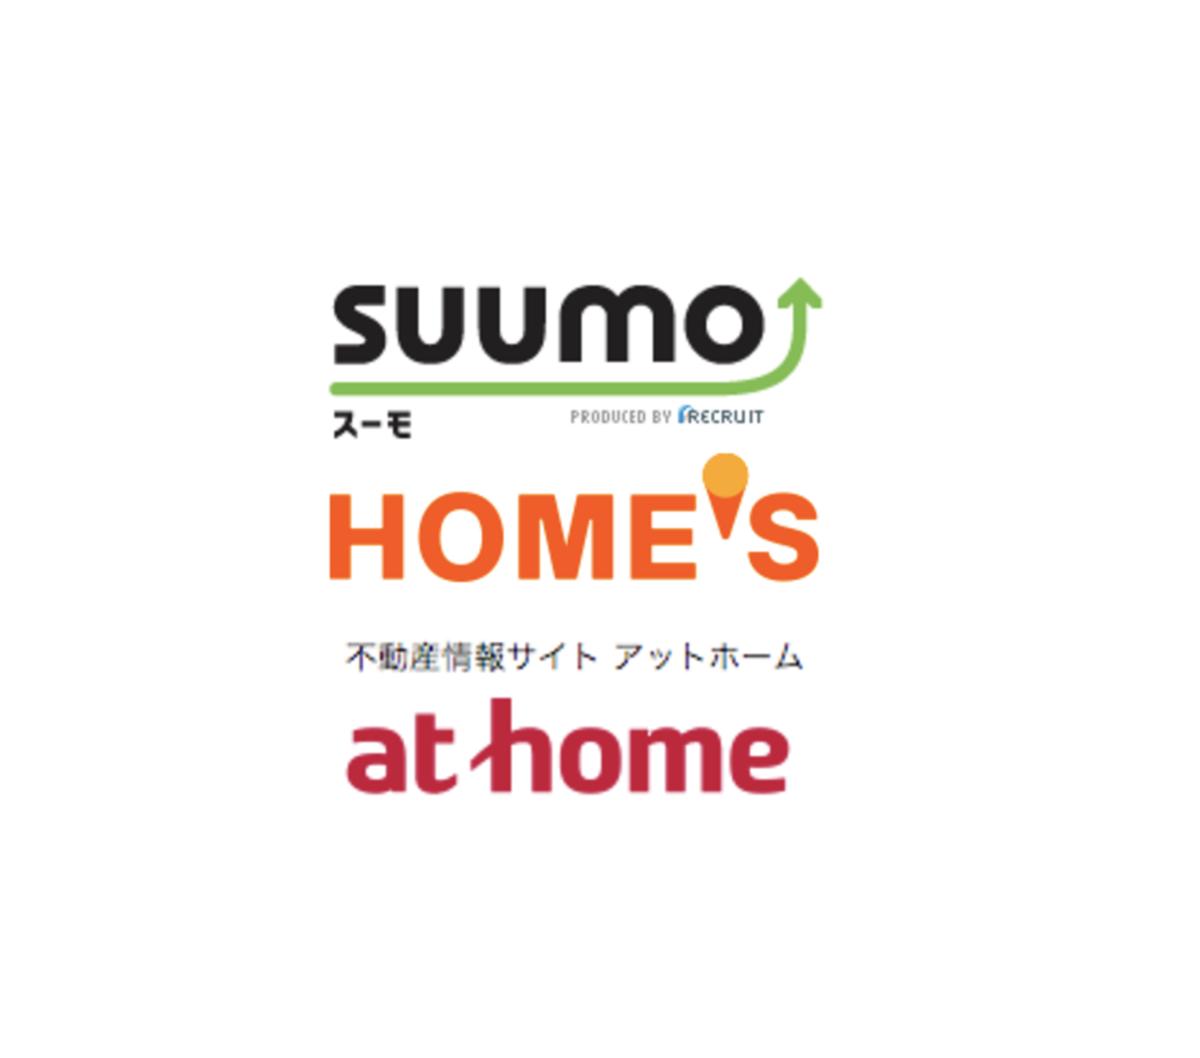 f:id:itsumo2525jp:20200224084003p:plain